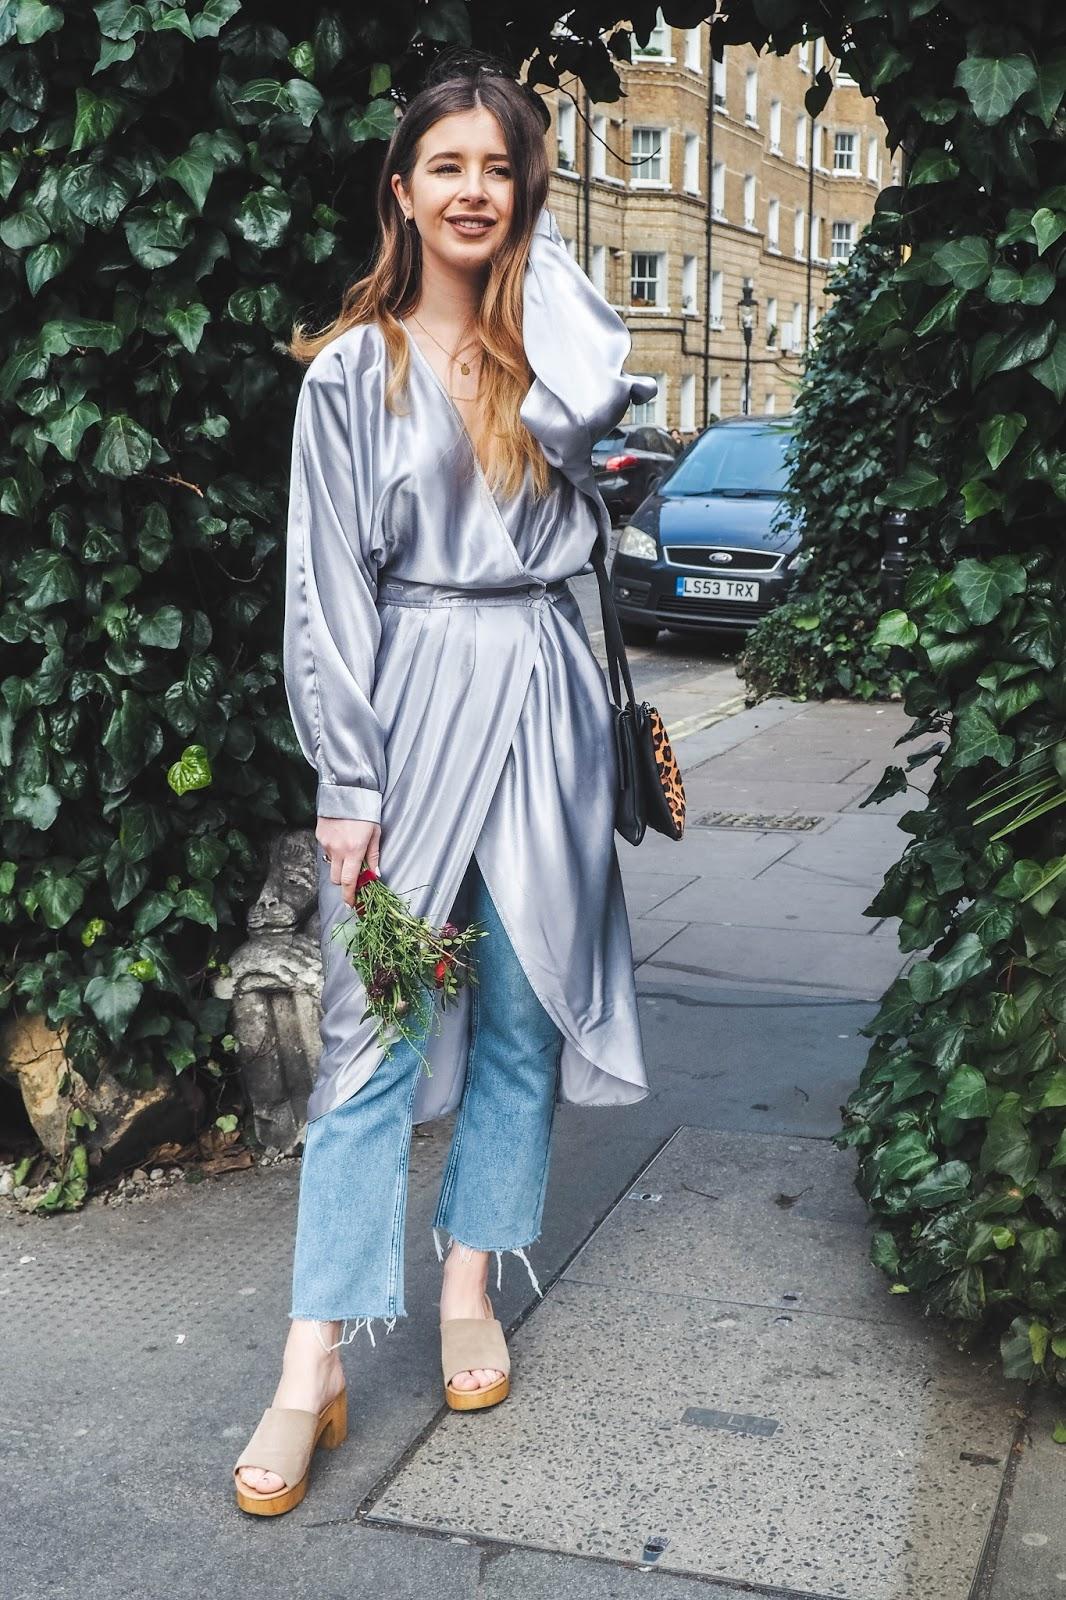 Ben noto Dresses Over Jeans | helloomonica UB46